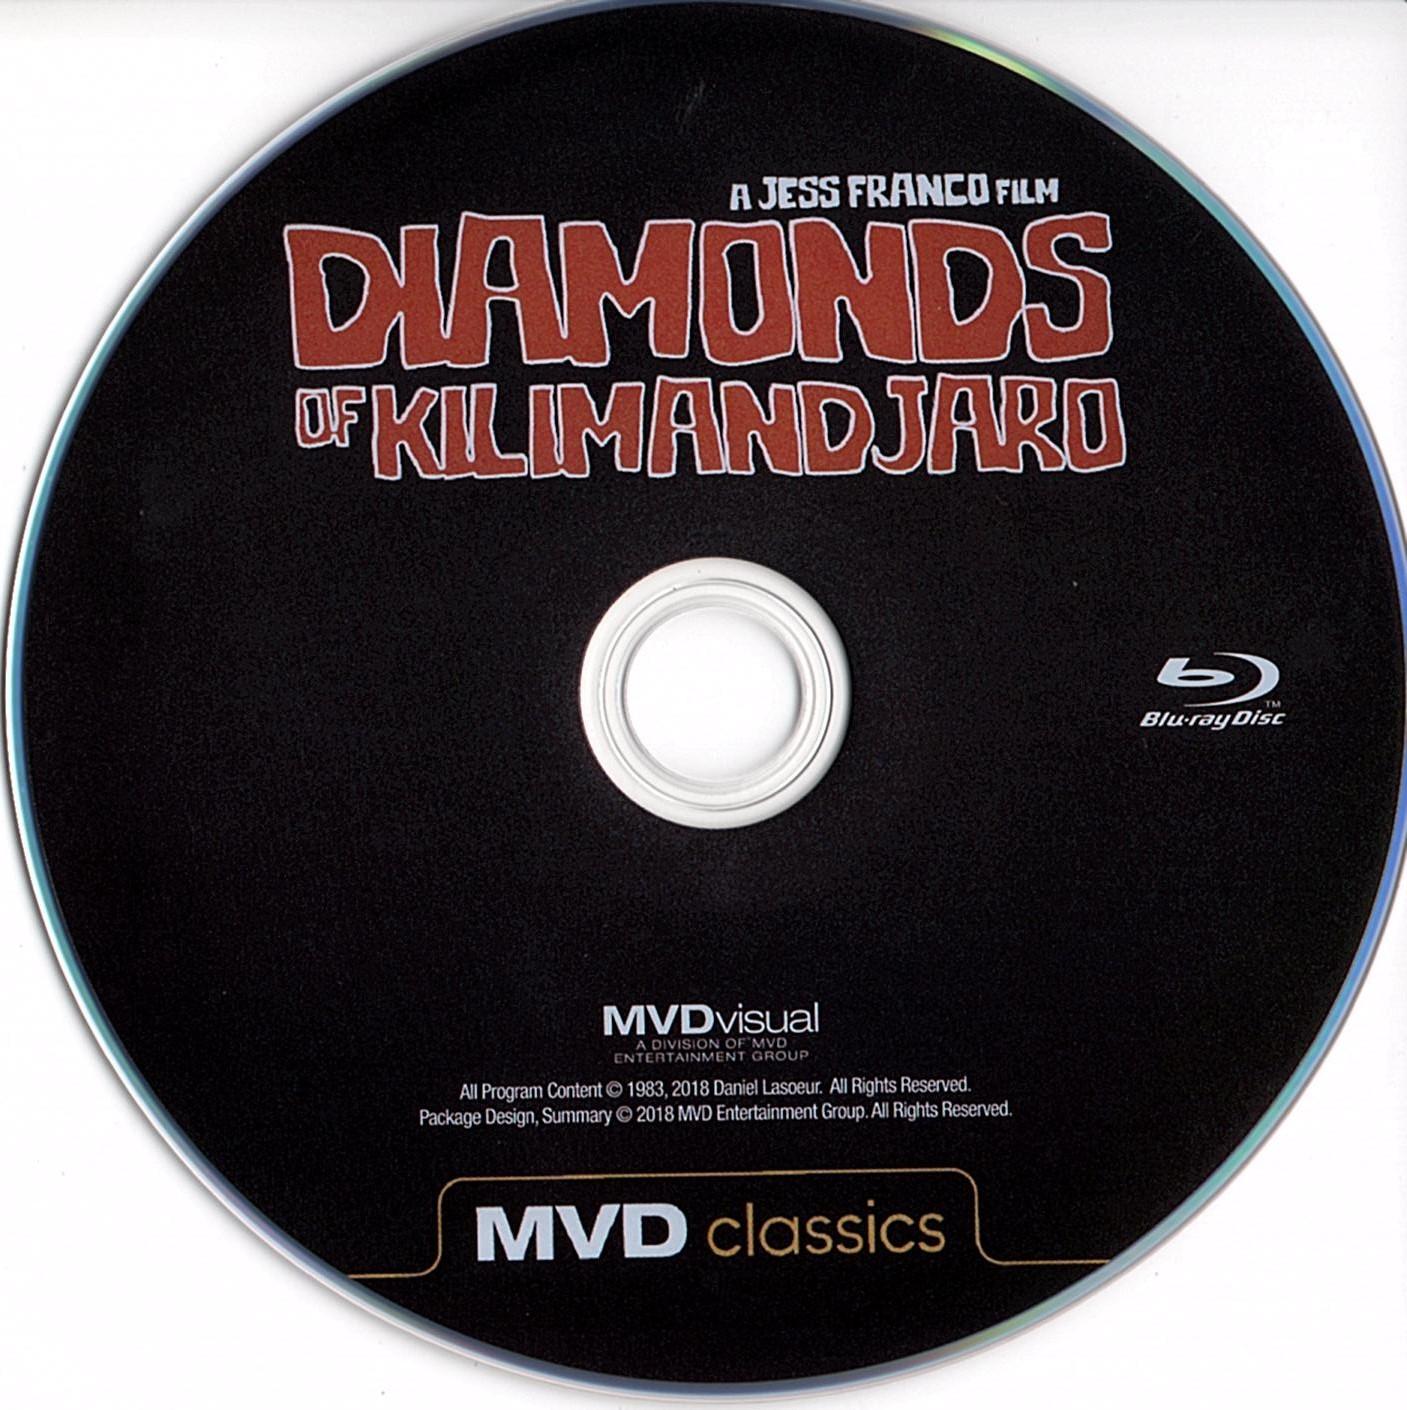 Diamonds of kilimanjaro 1983 online dating